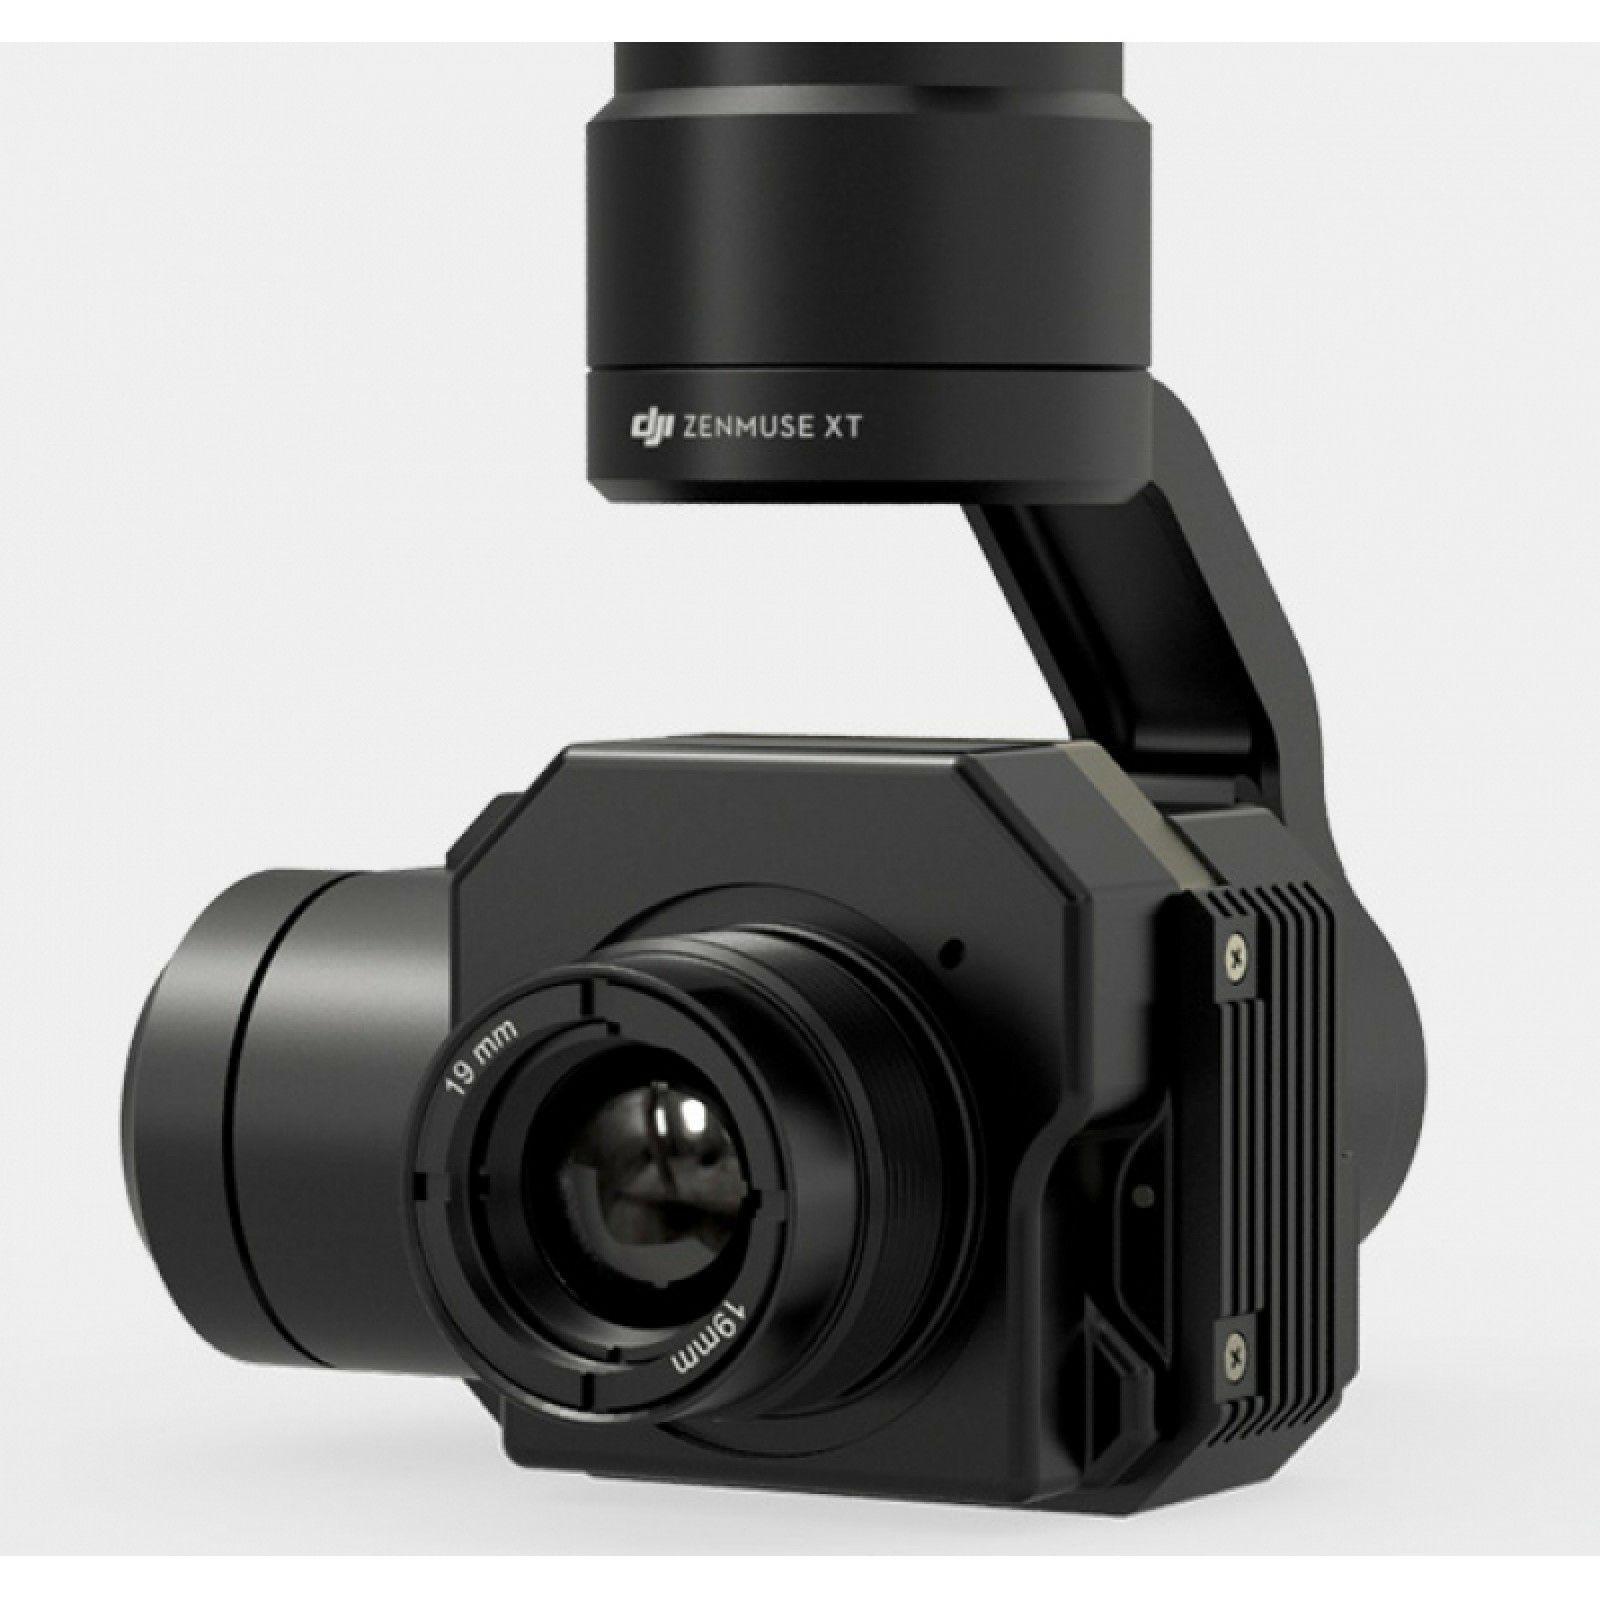 DJI Zenmuse XT Thermal Camera ZXTA13FR 640x512 30Hz (Fast frame) Lens 13mm objektiv termovizijska kamera (radiometry temperature measurement model)